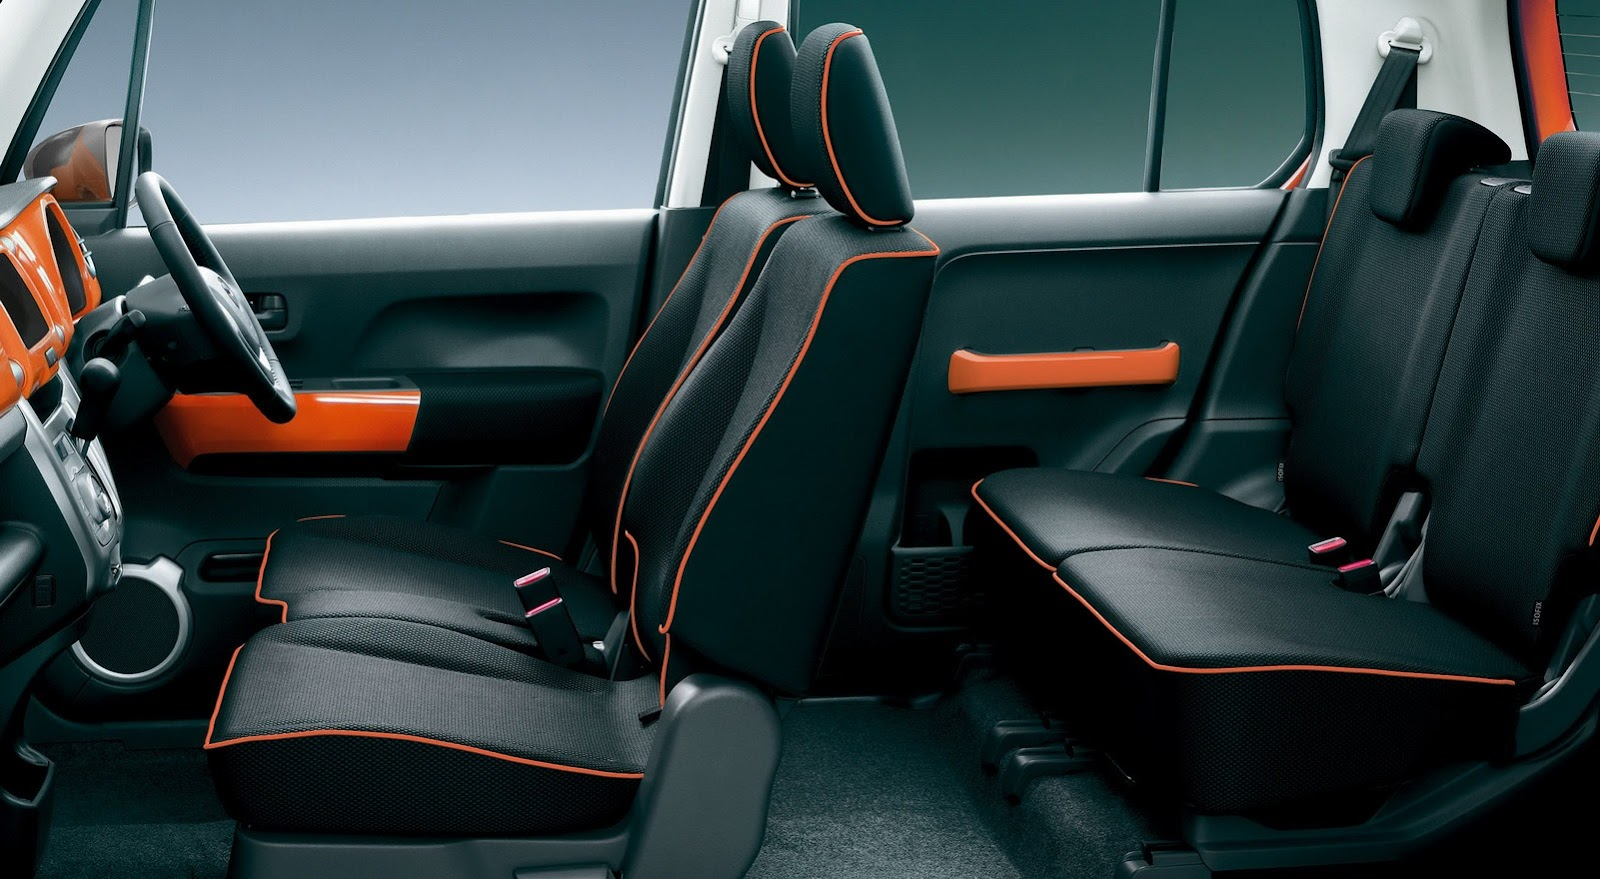 2014 - [Mazda/Suzuki] Flair Crossover / Hustler Mazda-Flair-Crossover-4%25255B3%25255D